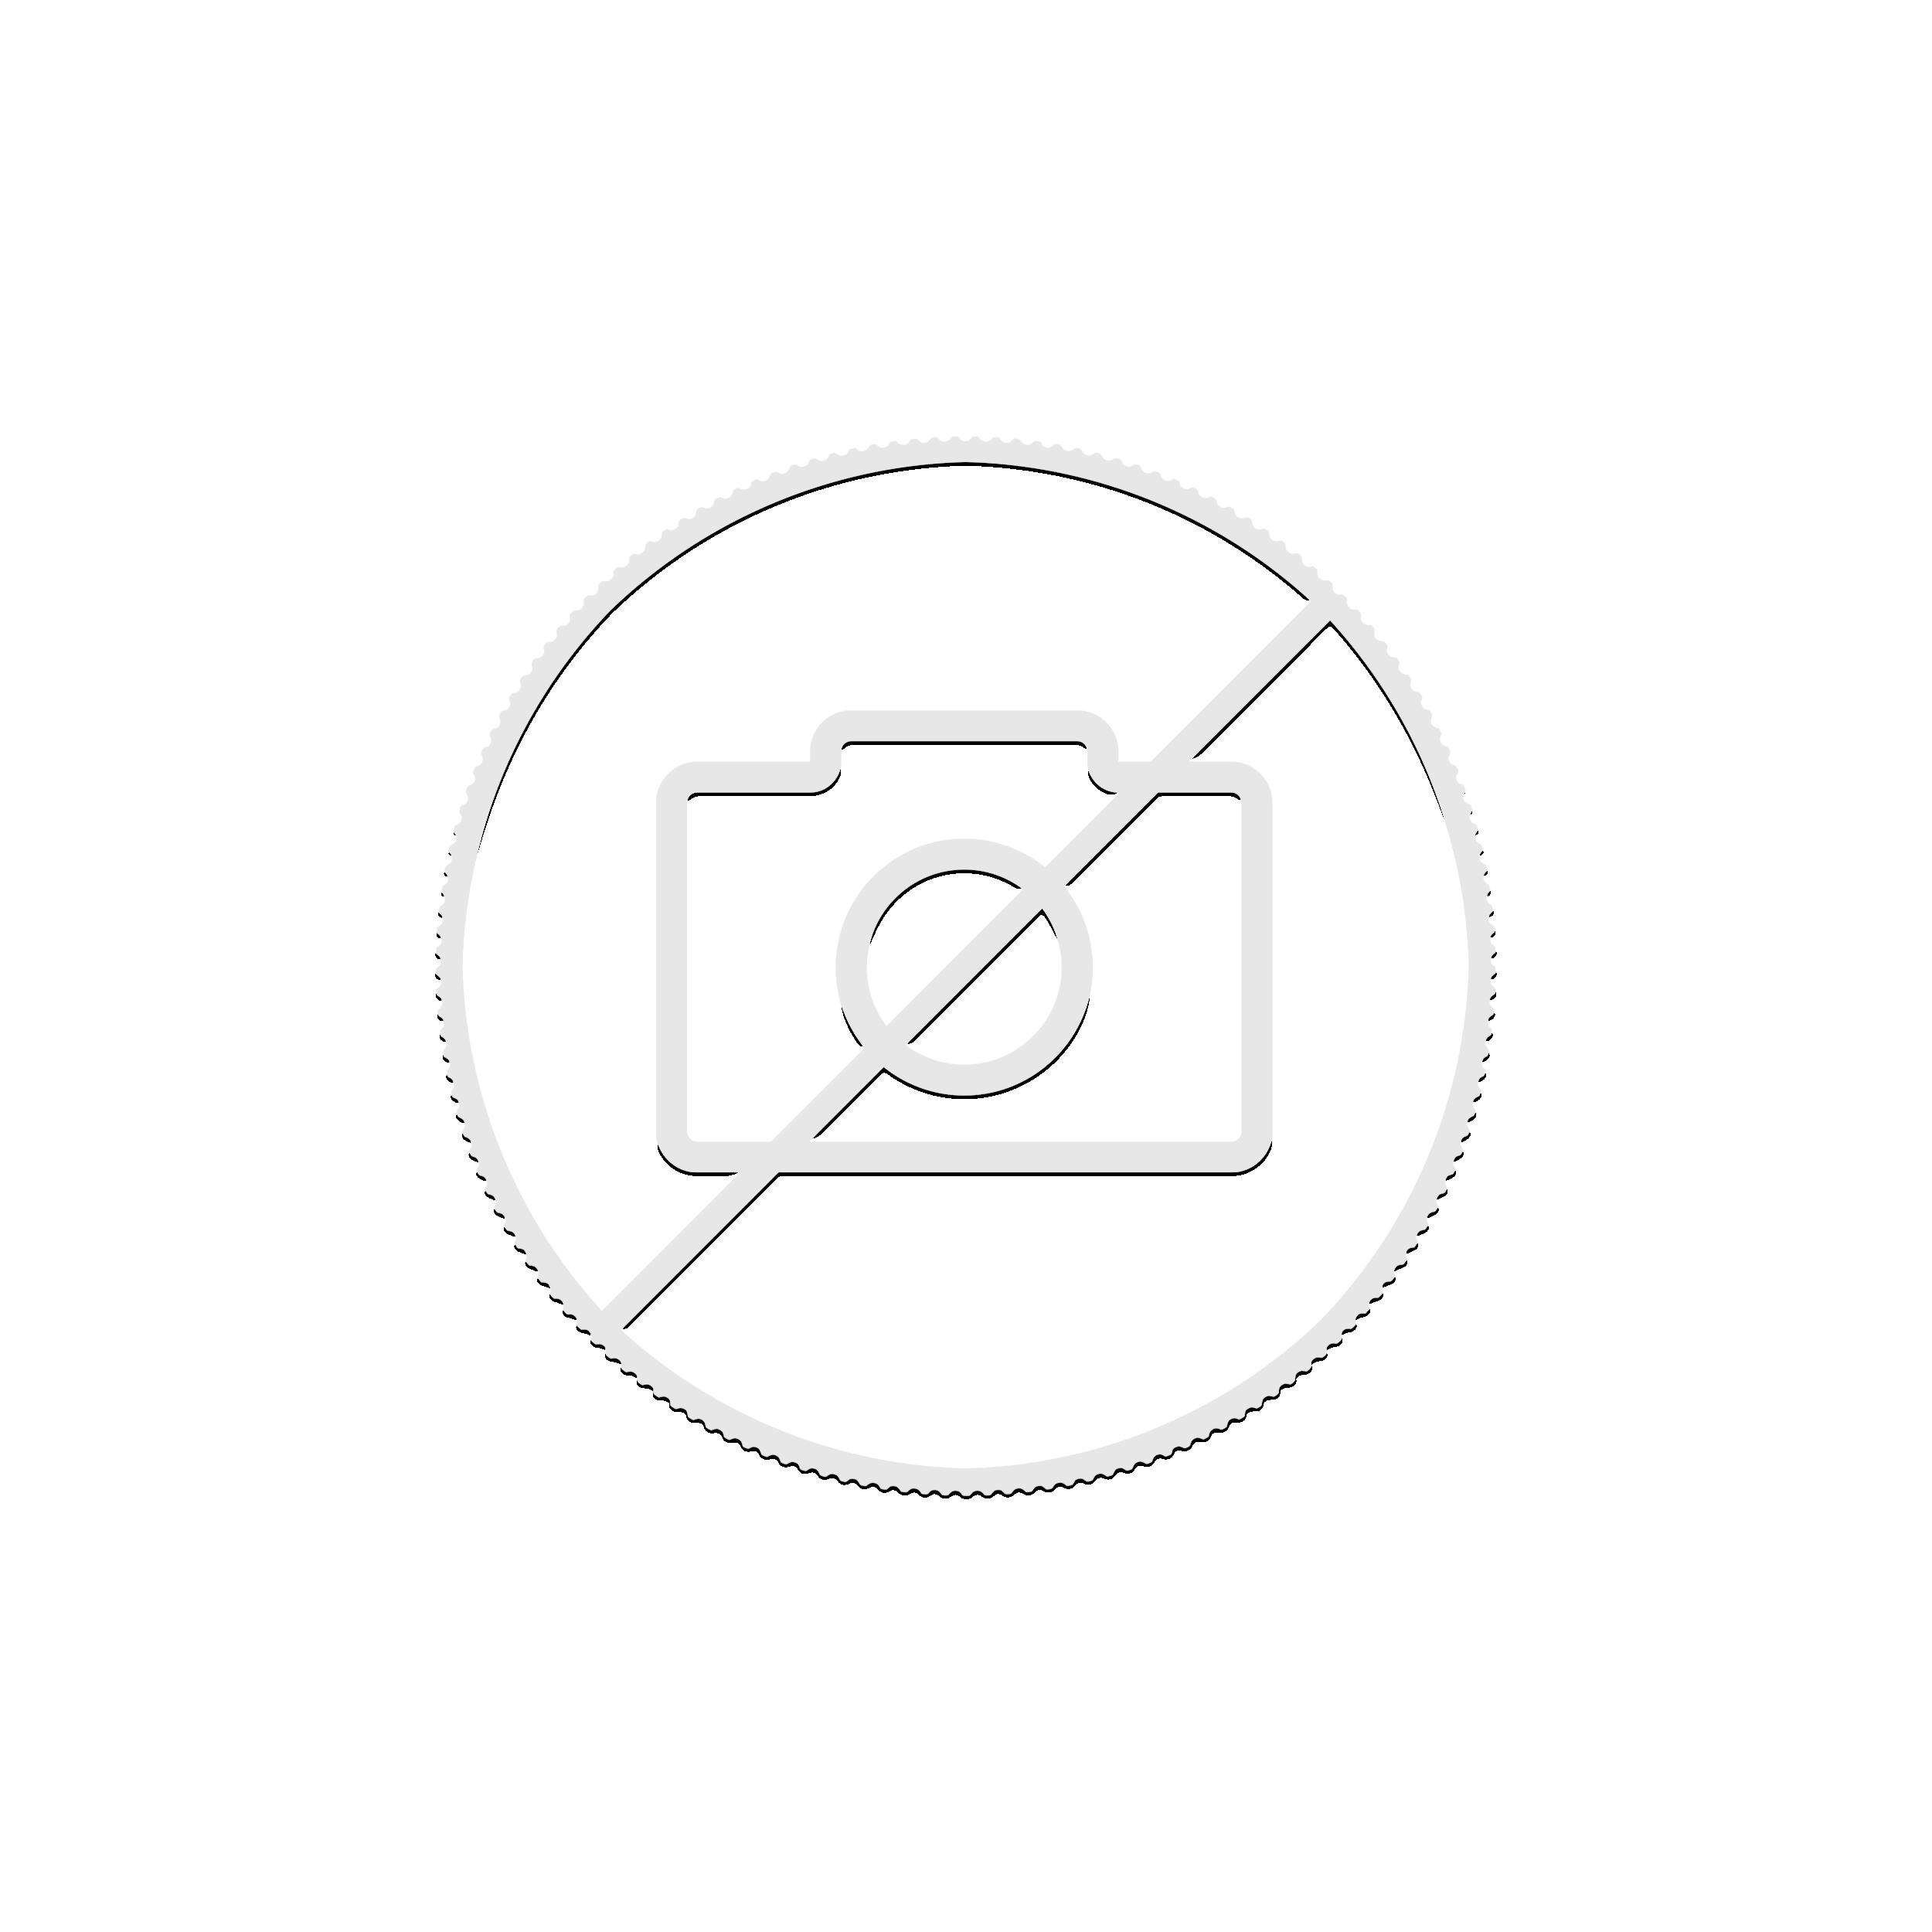 1 troy ounce zilver Britannia 2019 munt